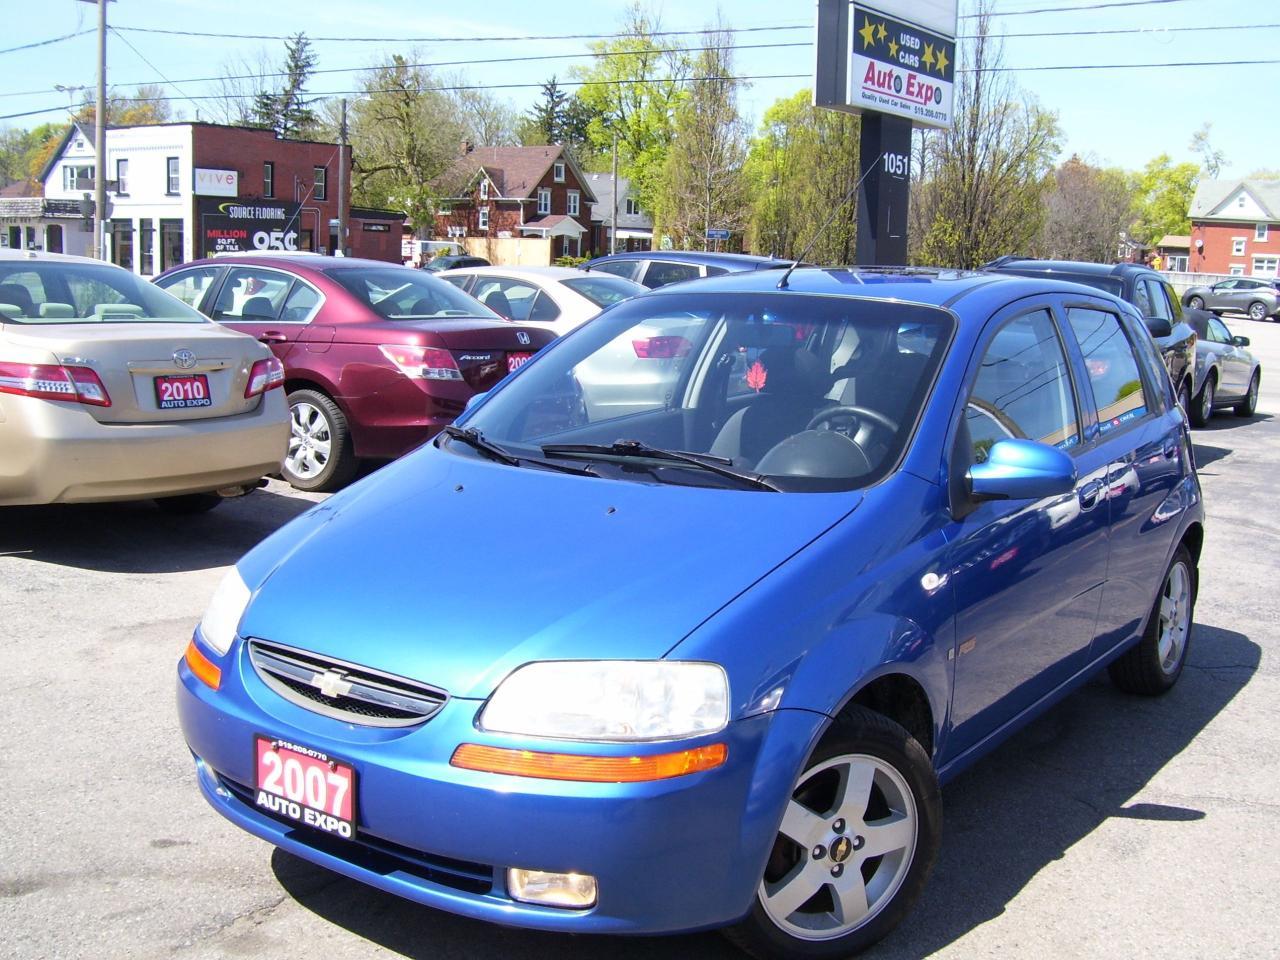 2007 Chevrolet Aveo LT,ALLOYS,SUNROOF,FOG LIGHTS,GAS SAVER,NO ACCIDENT